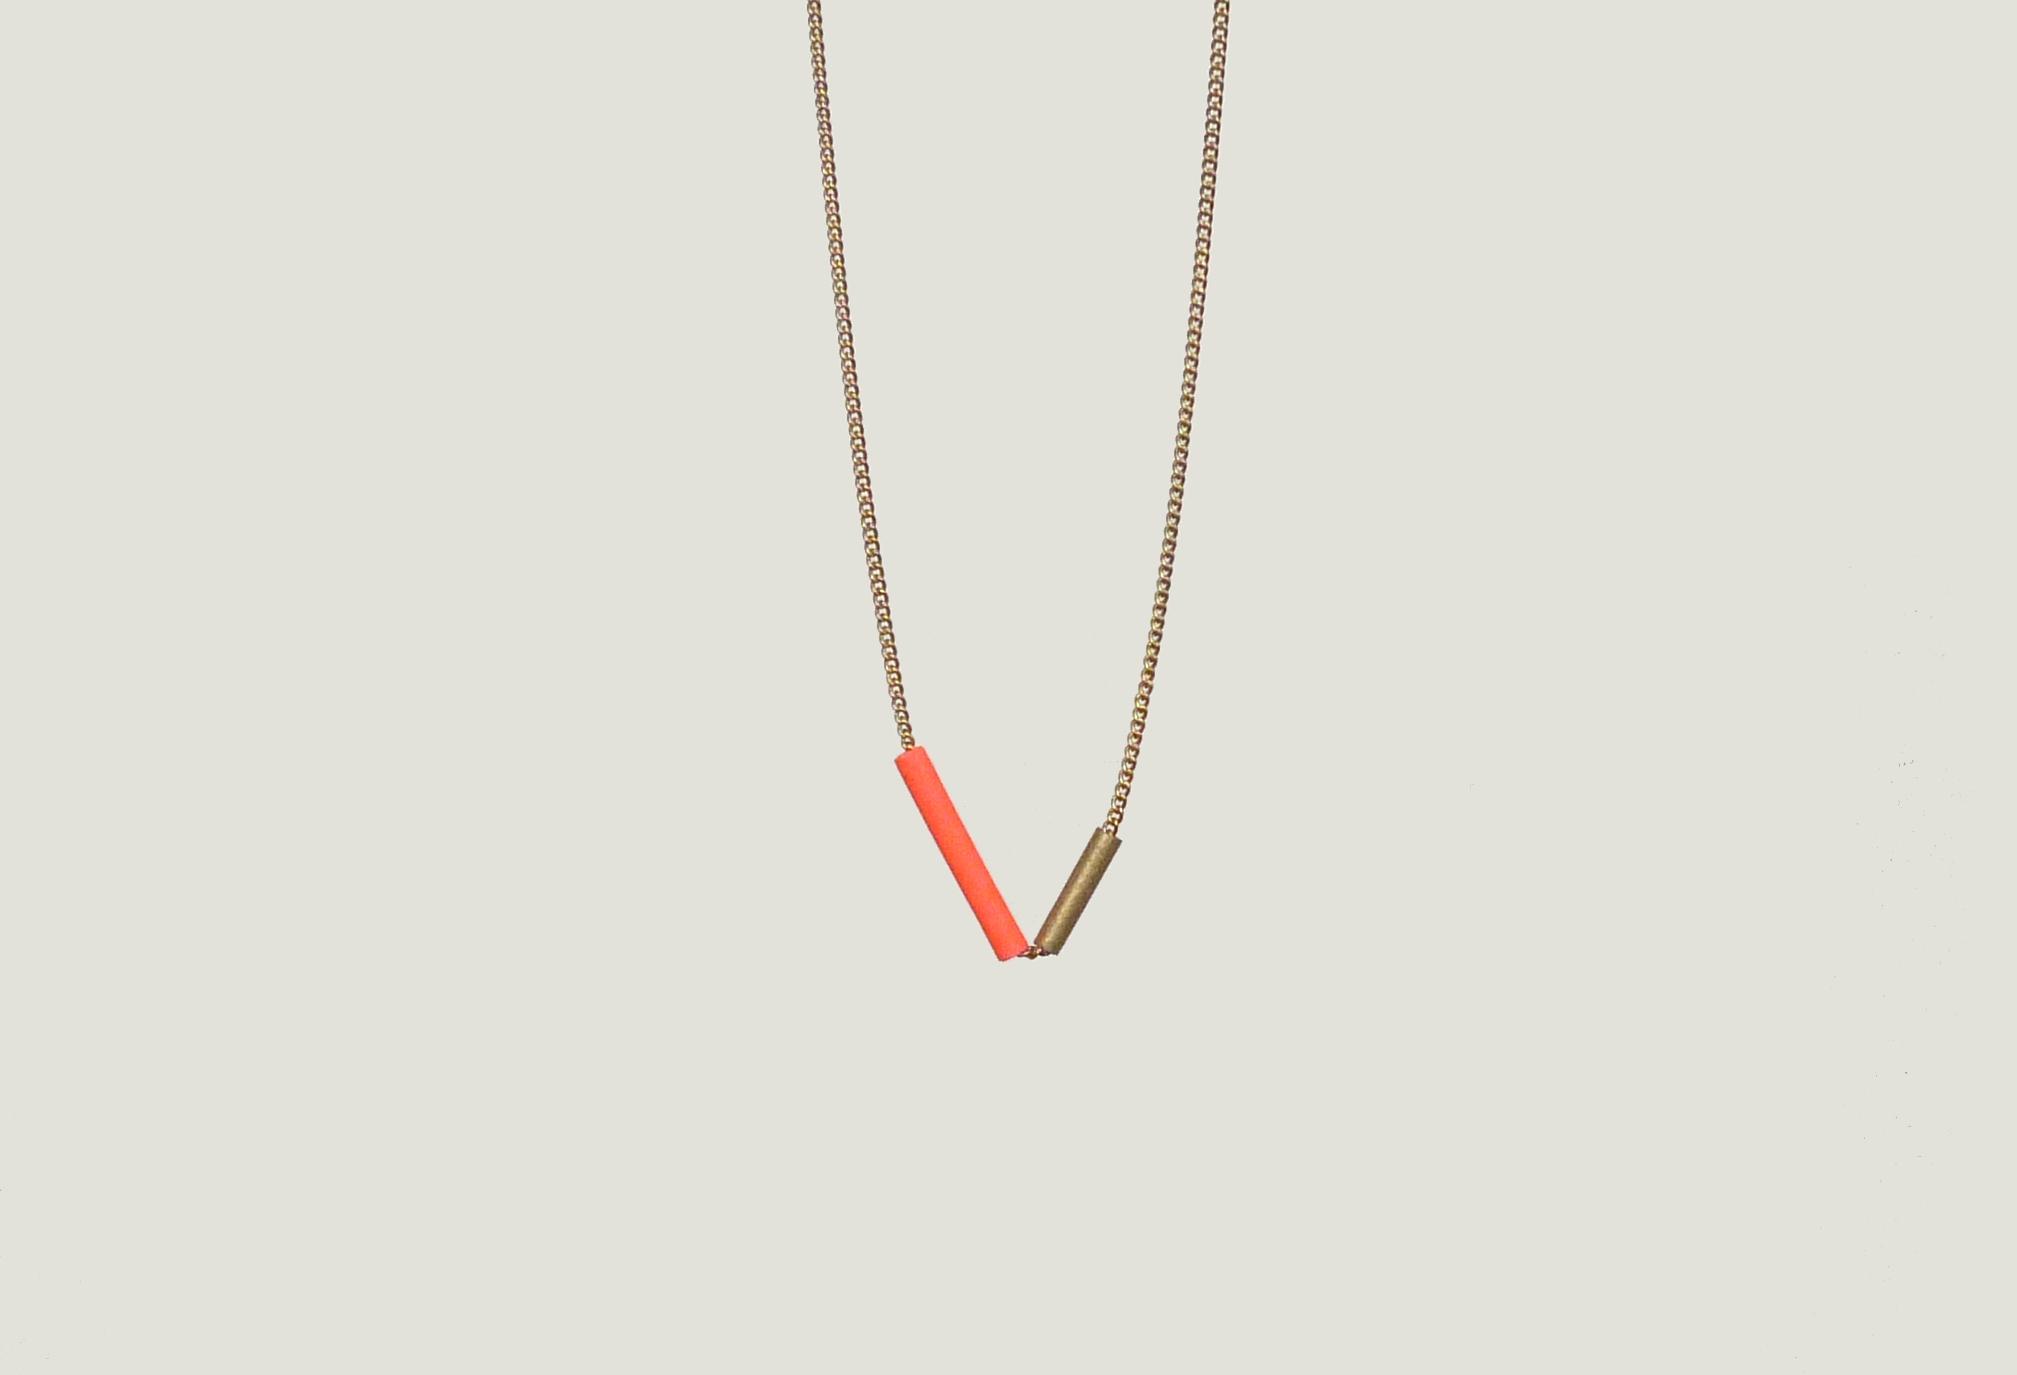 papierperle-kette-paperdesc-orange-2016